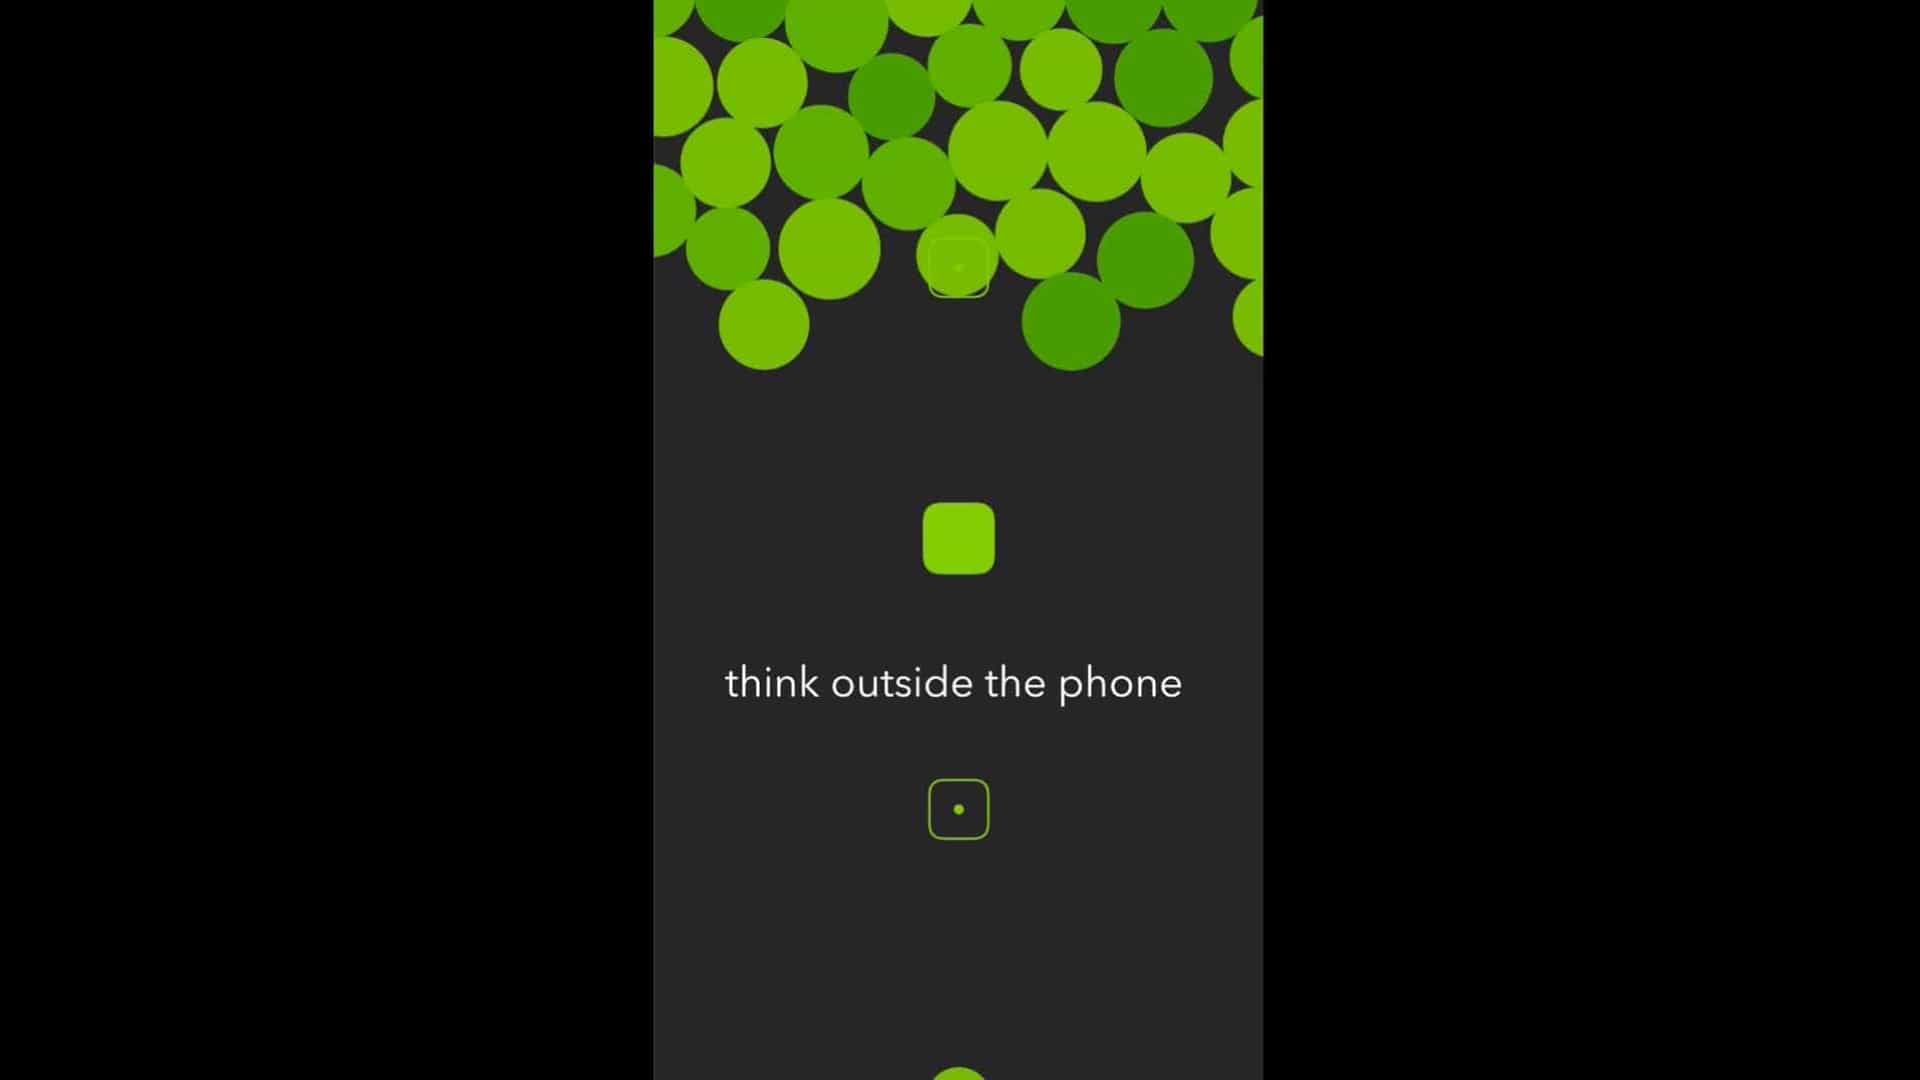 Blackbox, o jogo para iPhone que está a dar que falar (e que pensar)